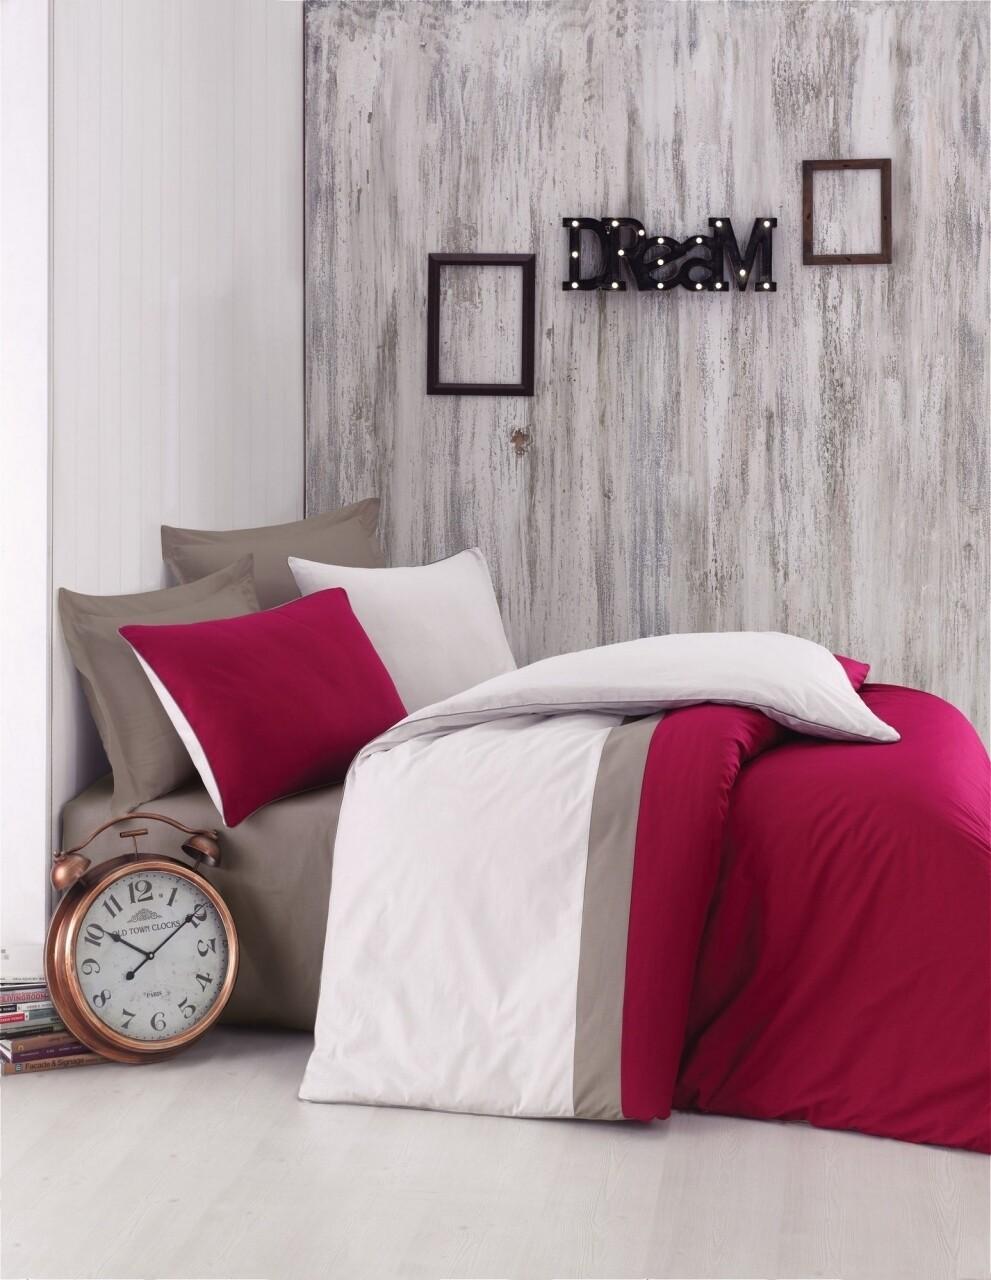 Lenjerie de pat pentru o persoana, 3 piese, 100% bumbac ranforce, Cotton Box, Plain Sport Claret Red